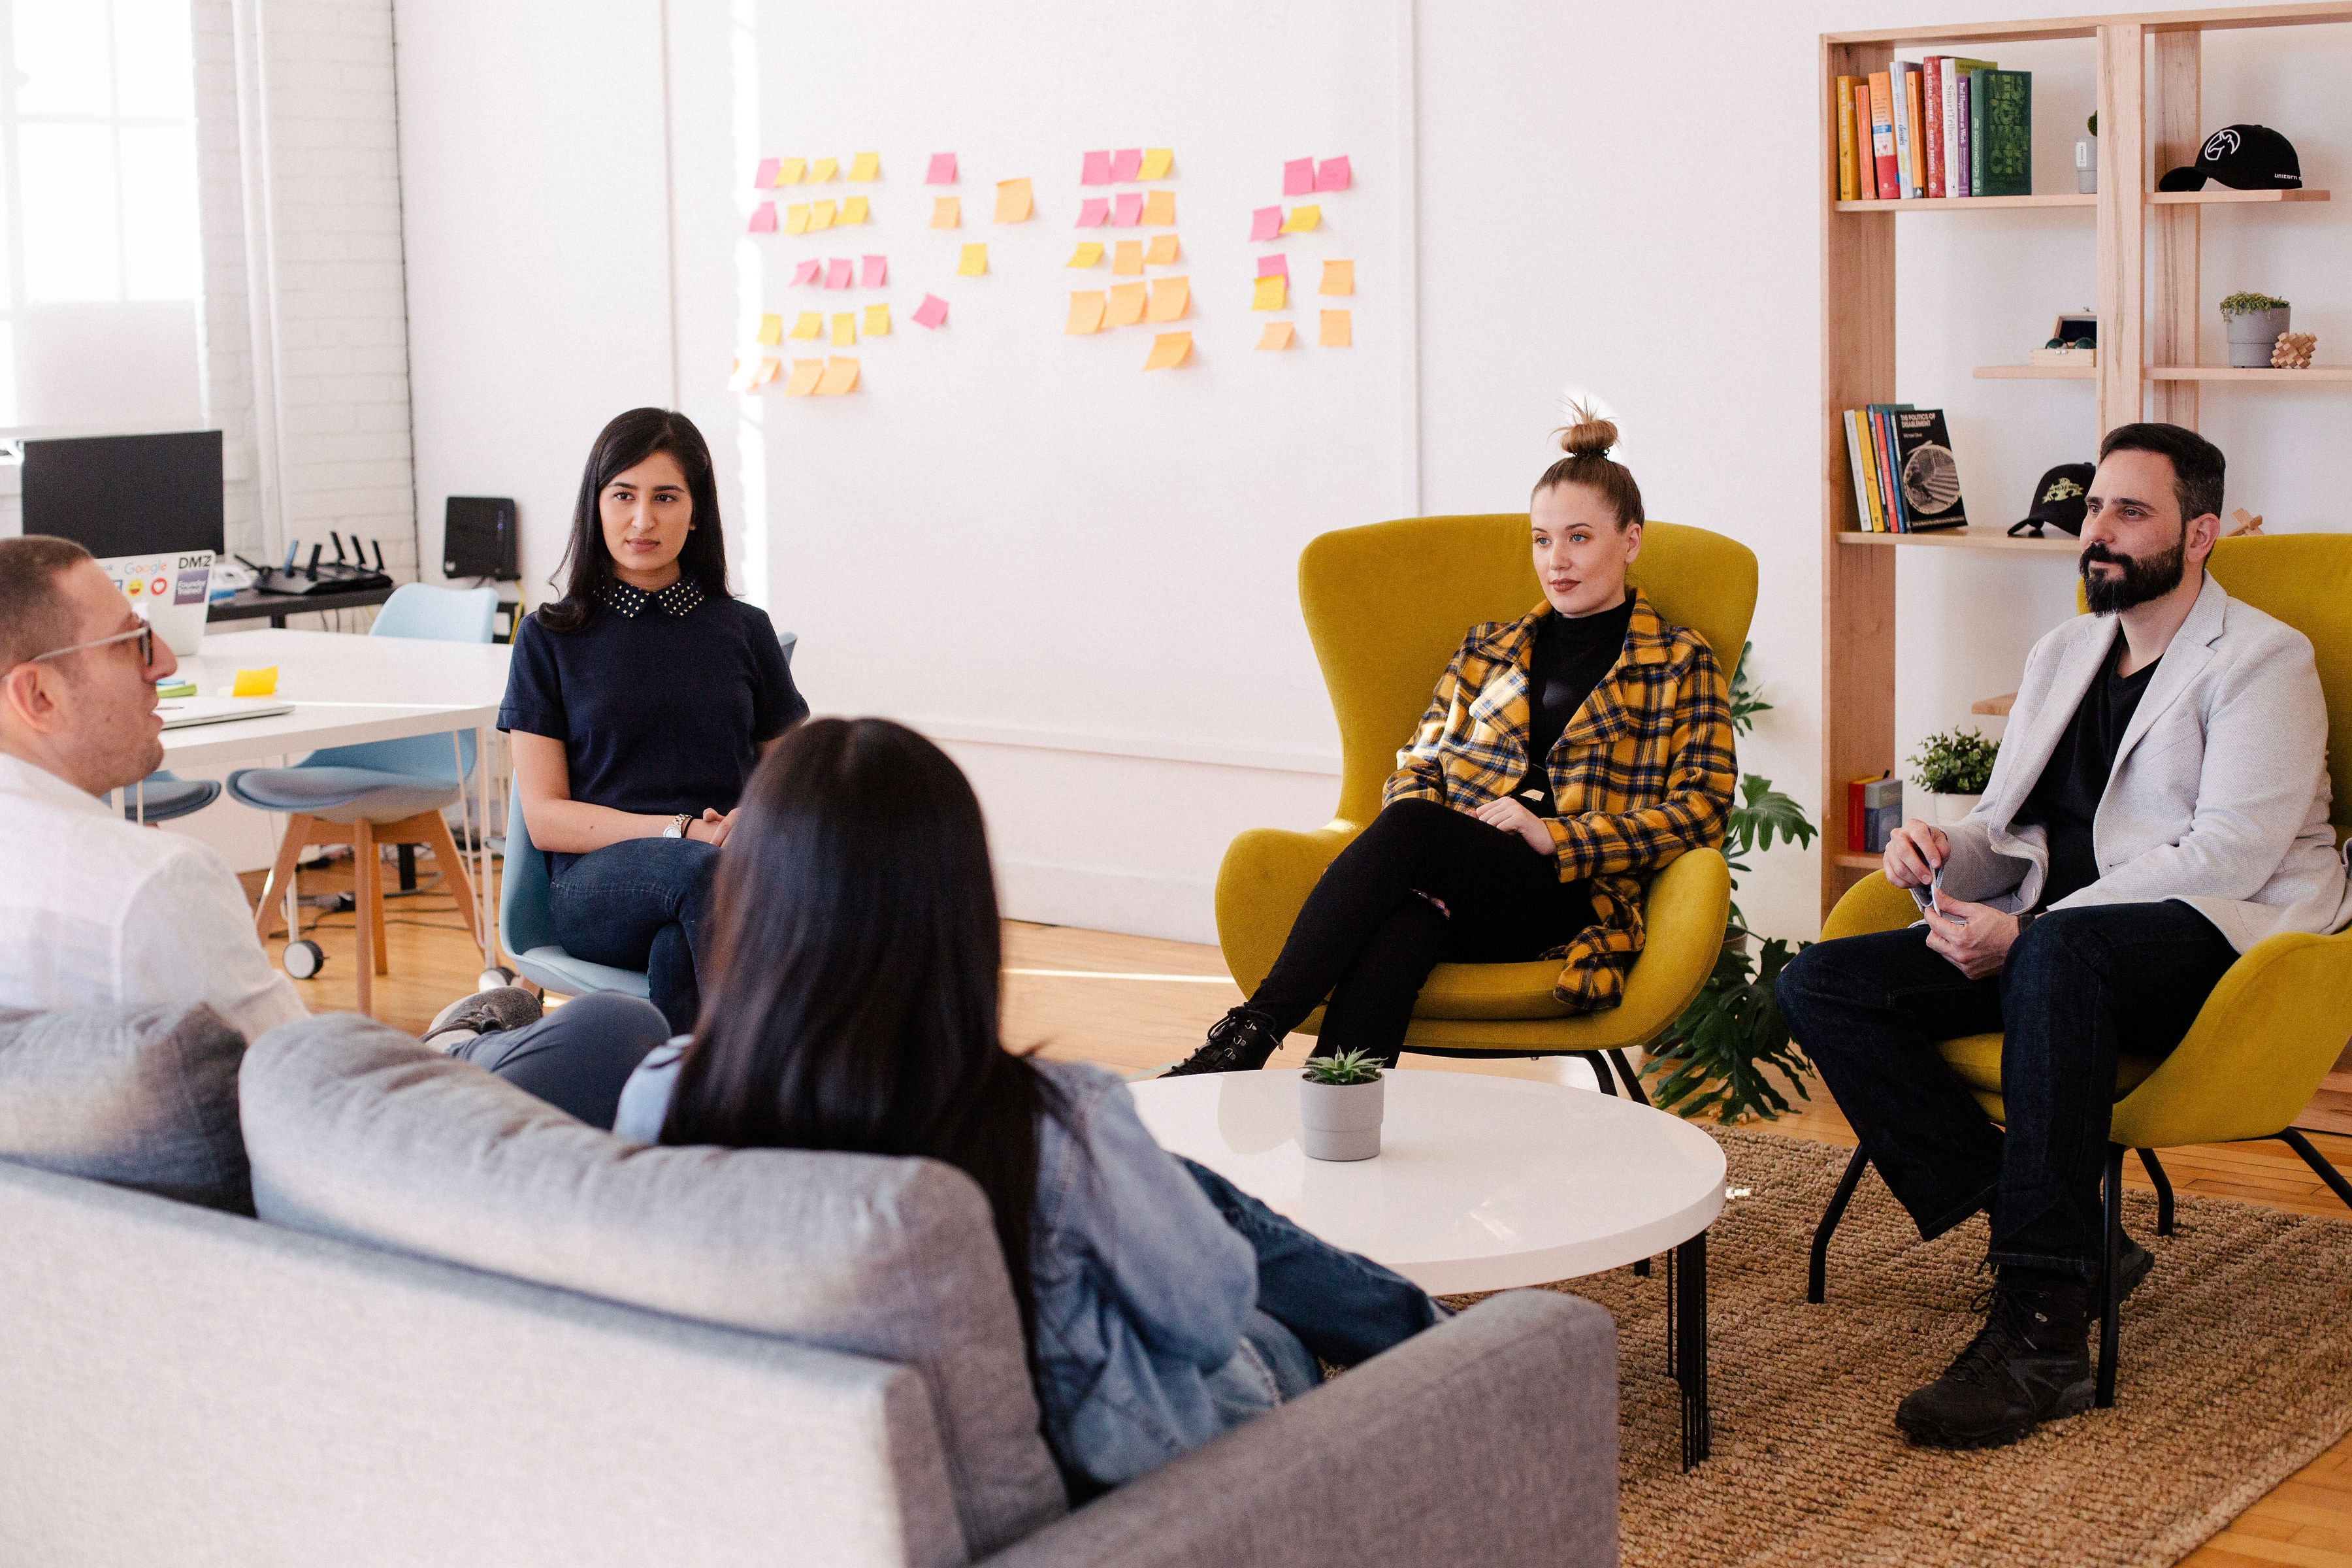 Team meeting at startup